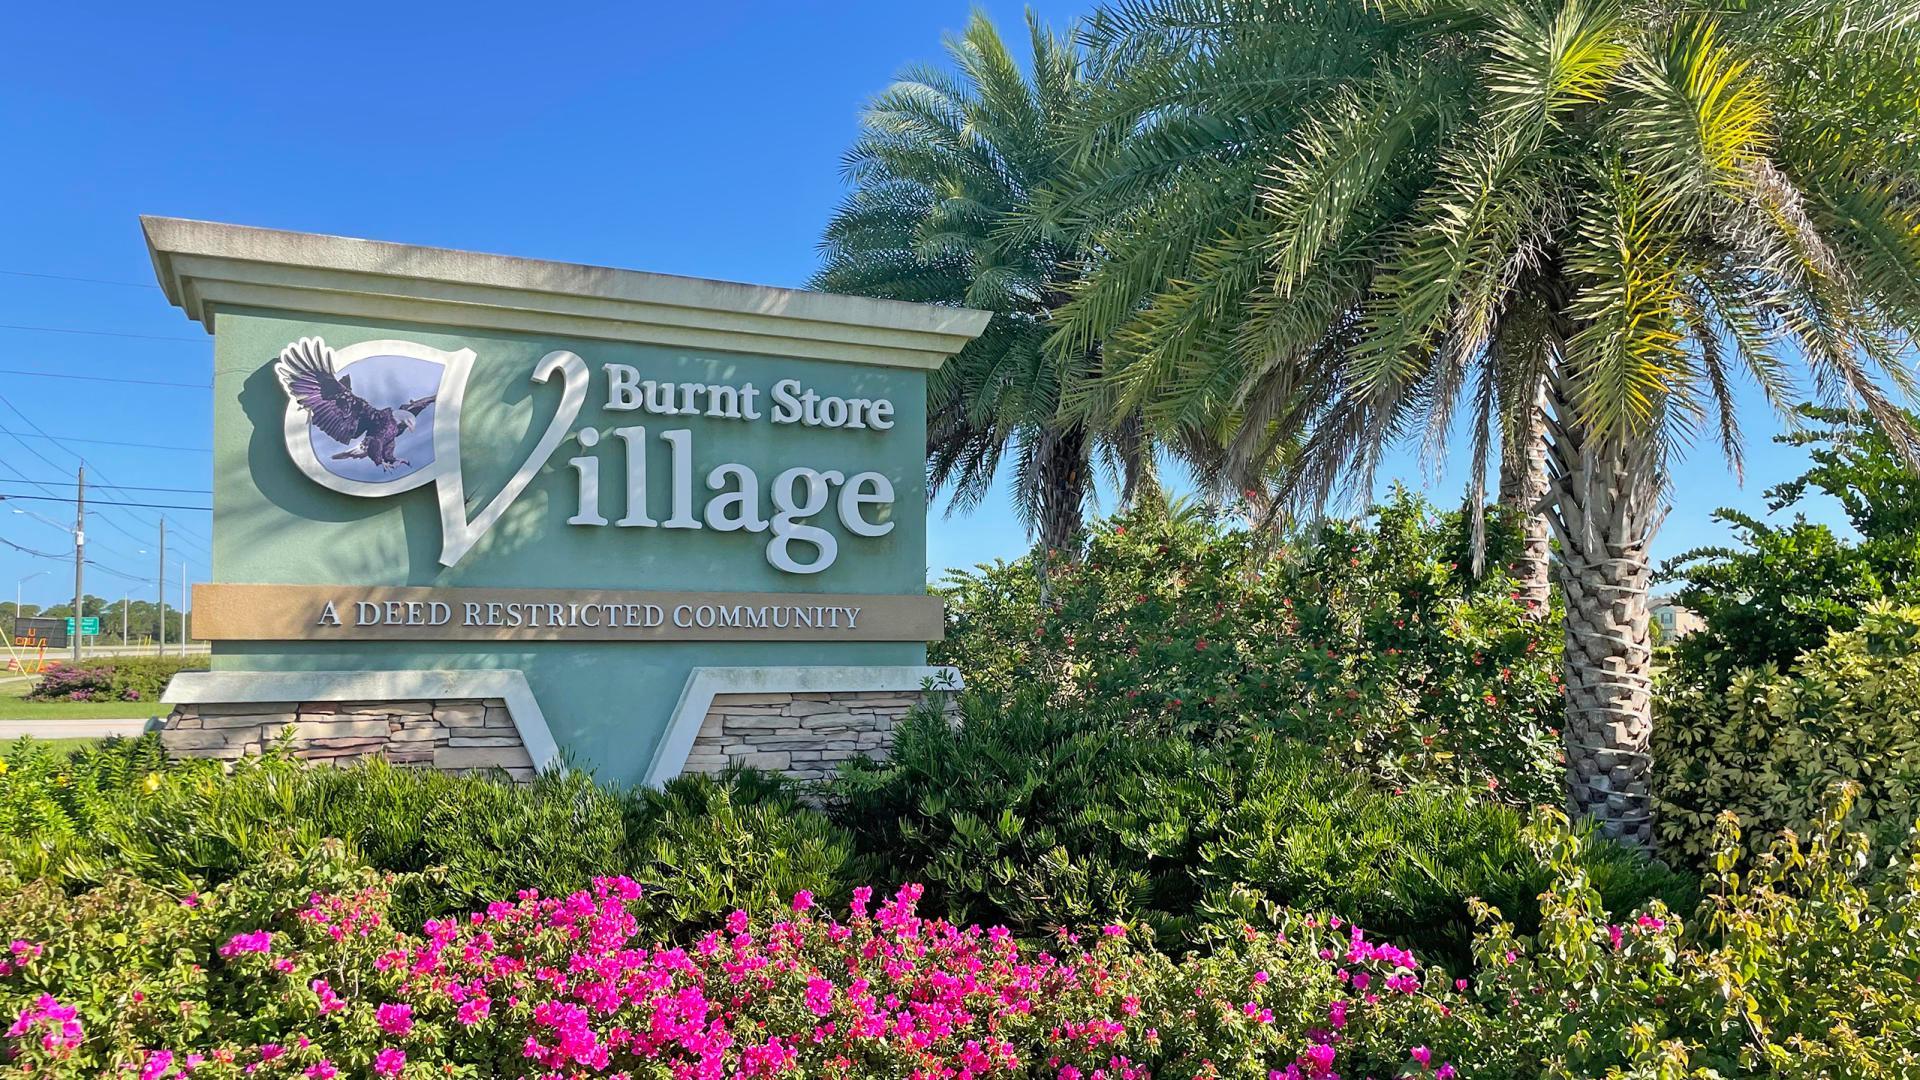 Burnt Store Village,33955